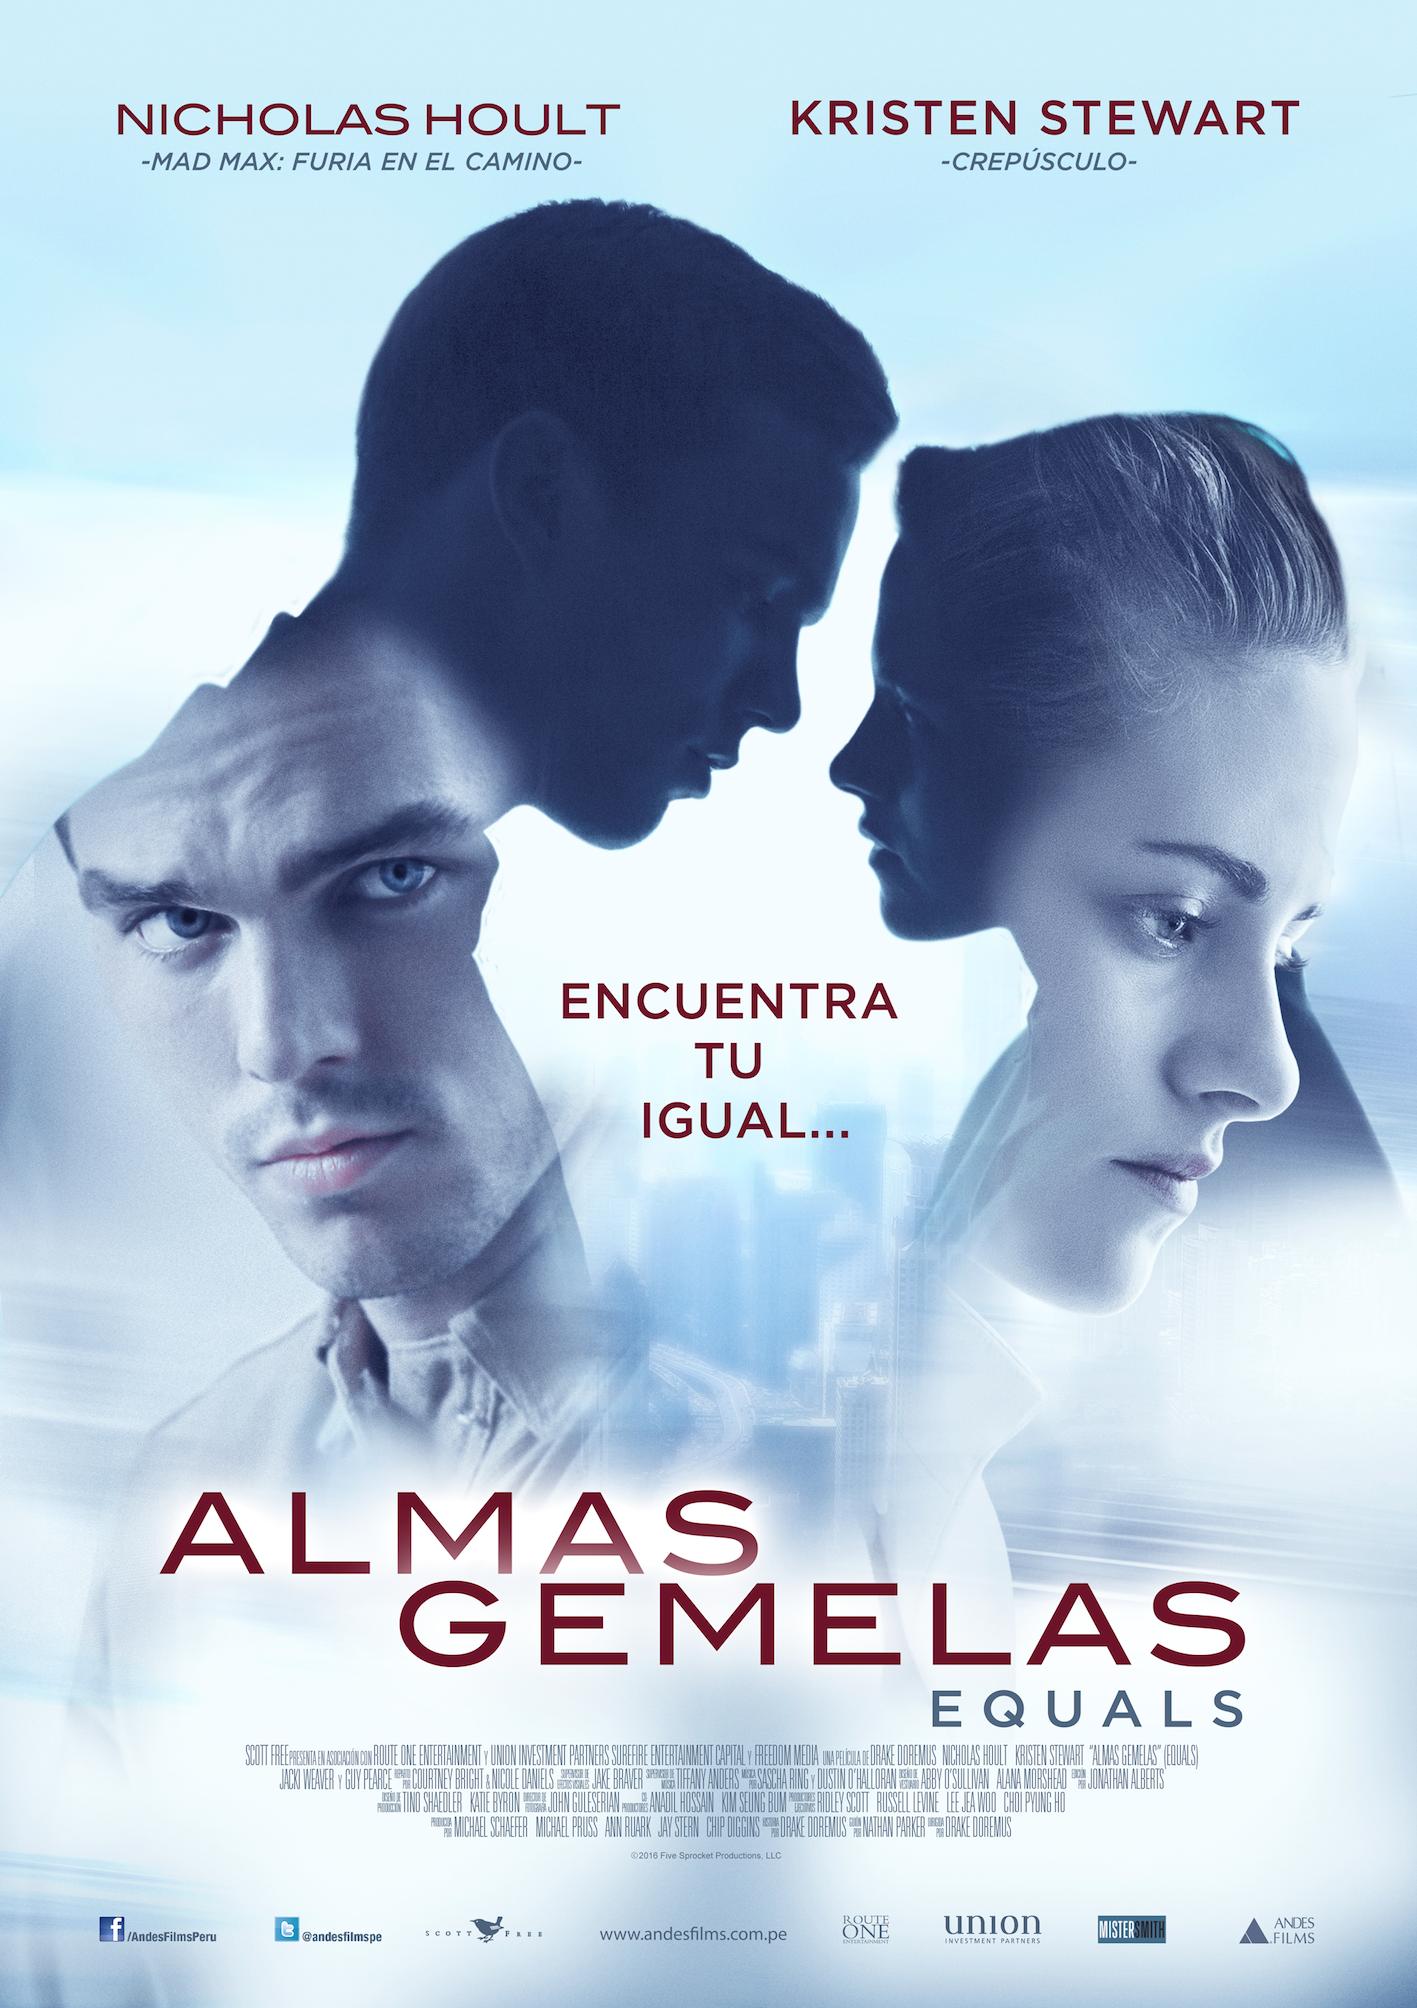 http://www.andesfilms.com.pe/almas-gemelas/